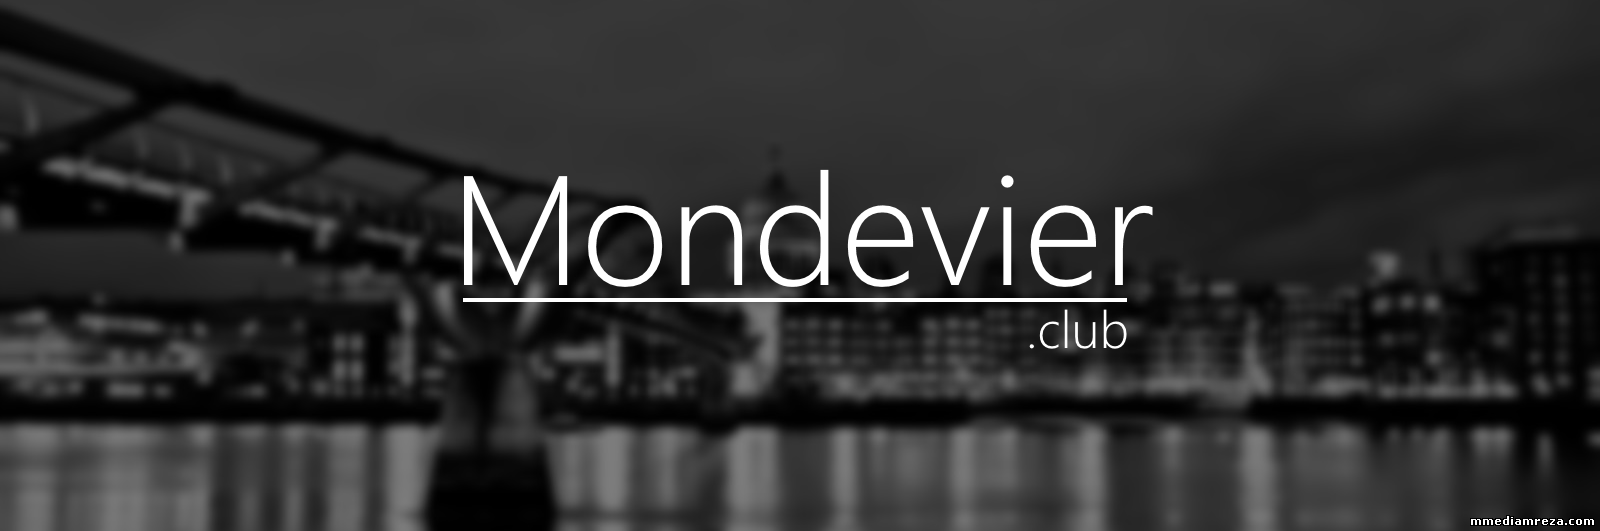 Mondevier - Poslovna društvena mreža koja vas plaća